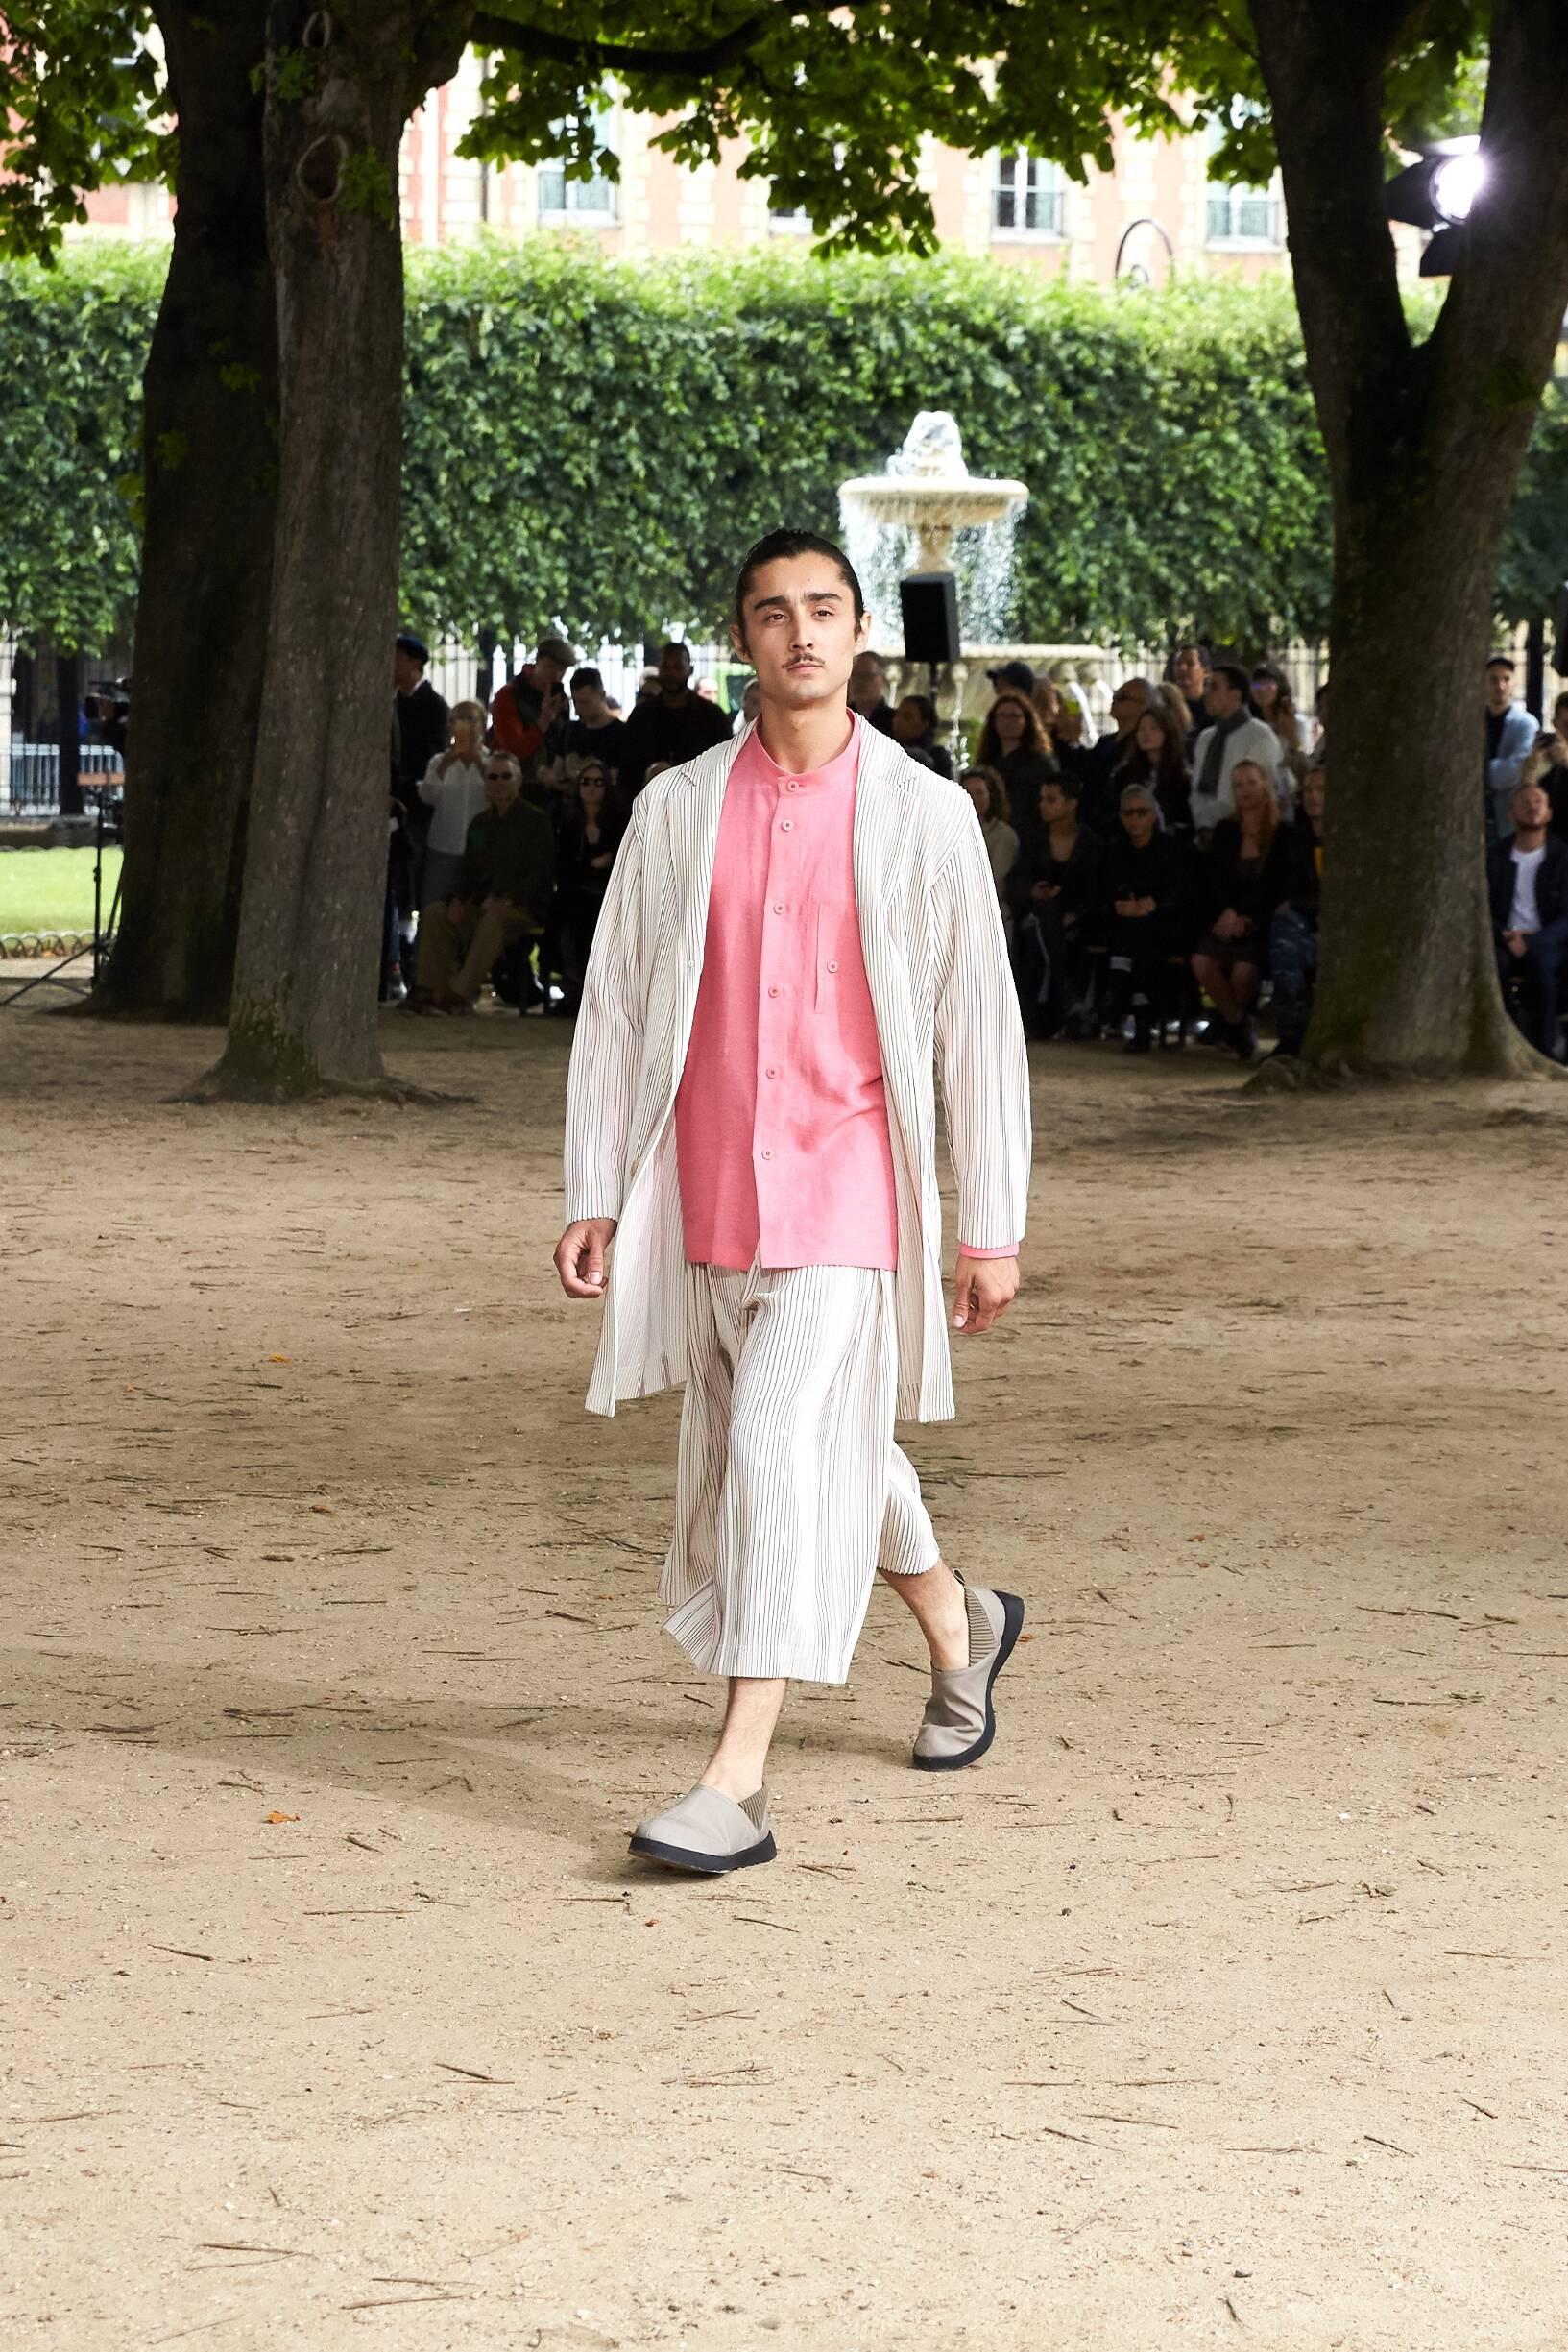 Issey Miyake Spring Summer 2020 Homme Plissé Collection Paris Fashion Week